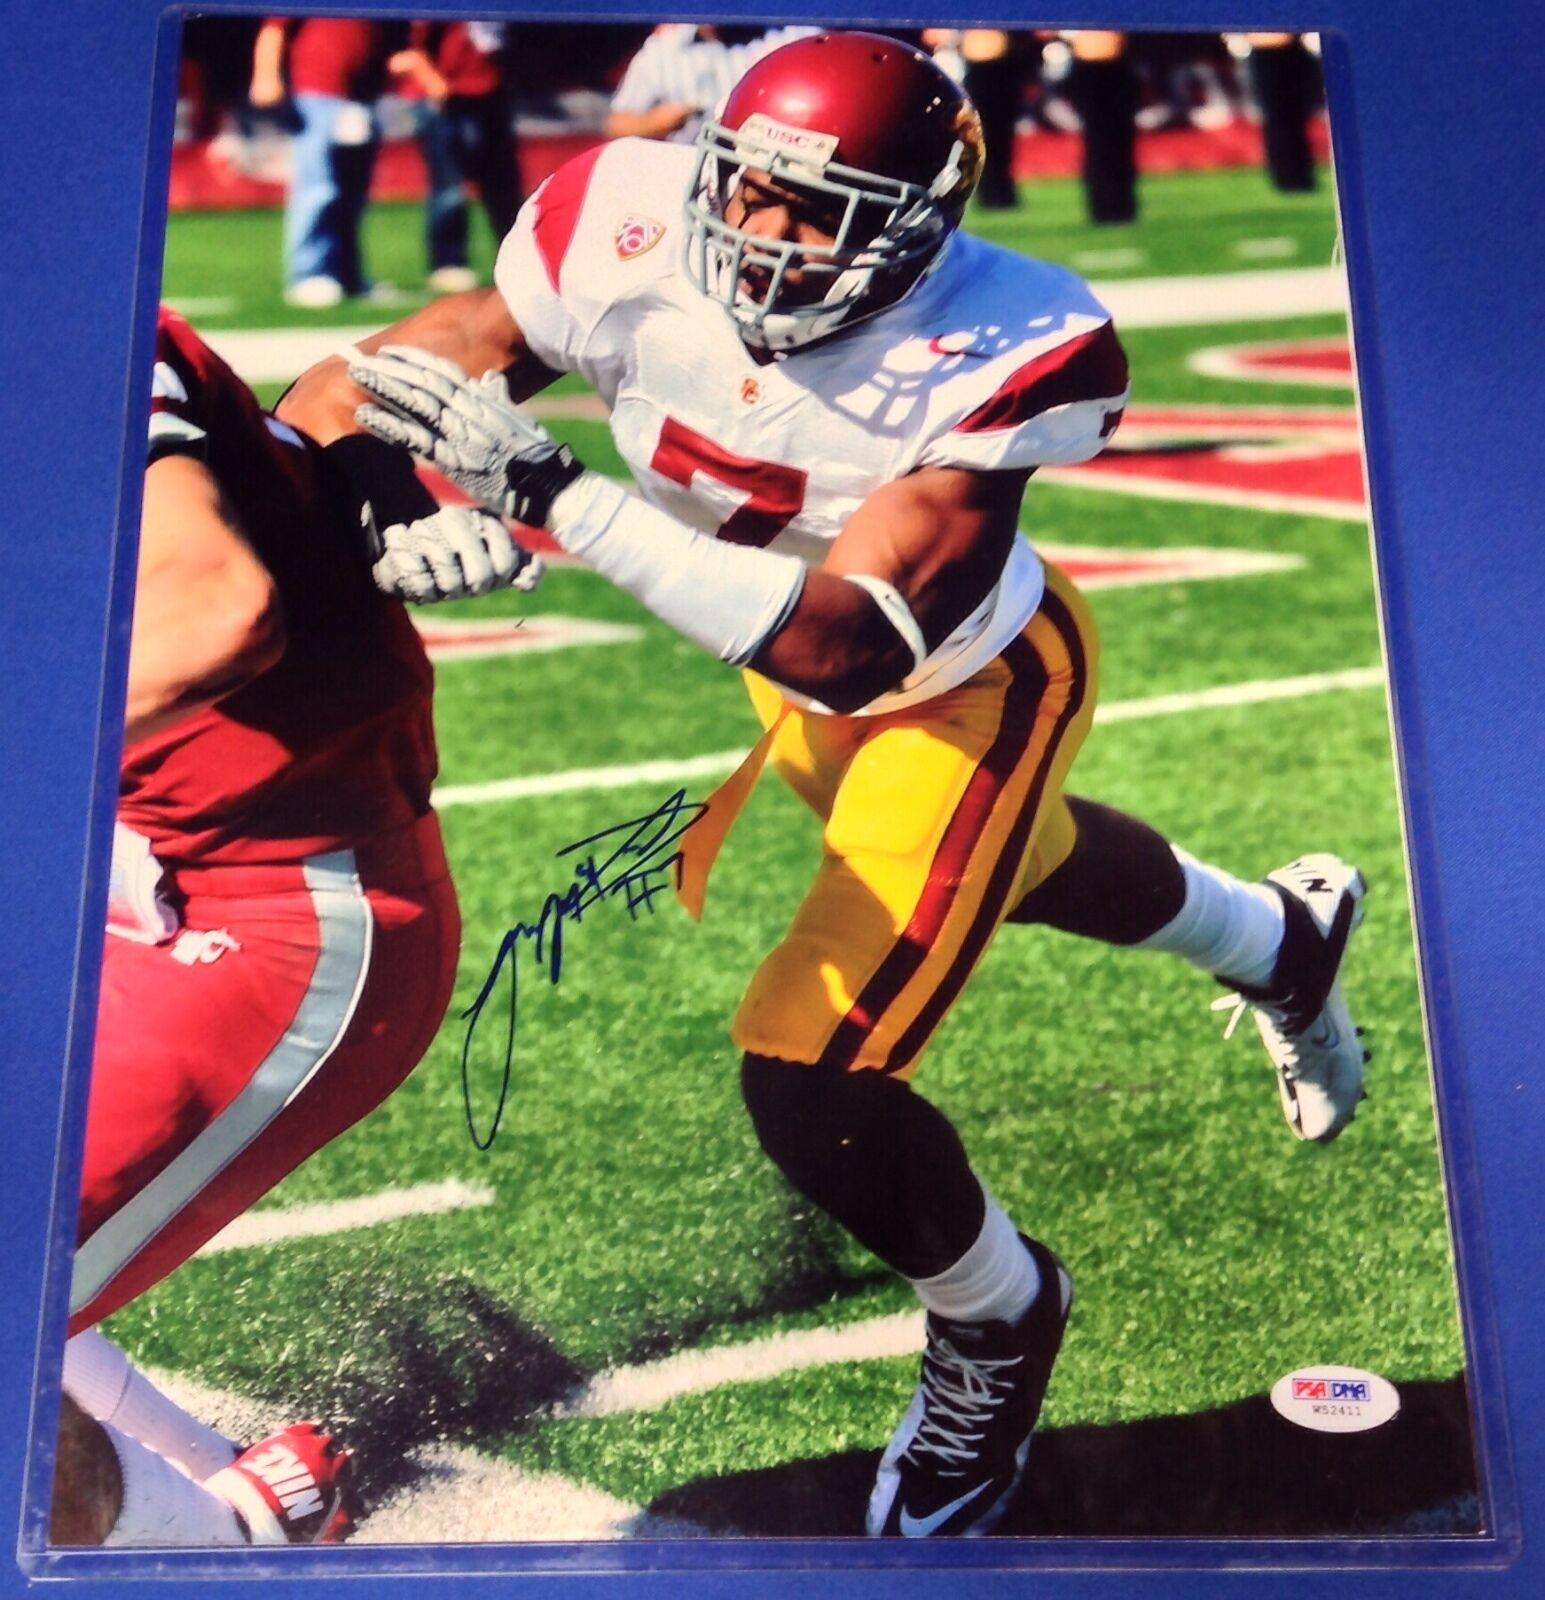 TJ McDonald USC Trojans Signed 11x14 Photo PSA/DNA #W52411